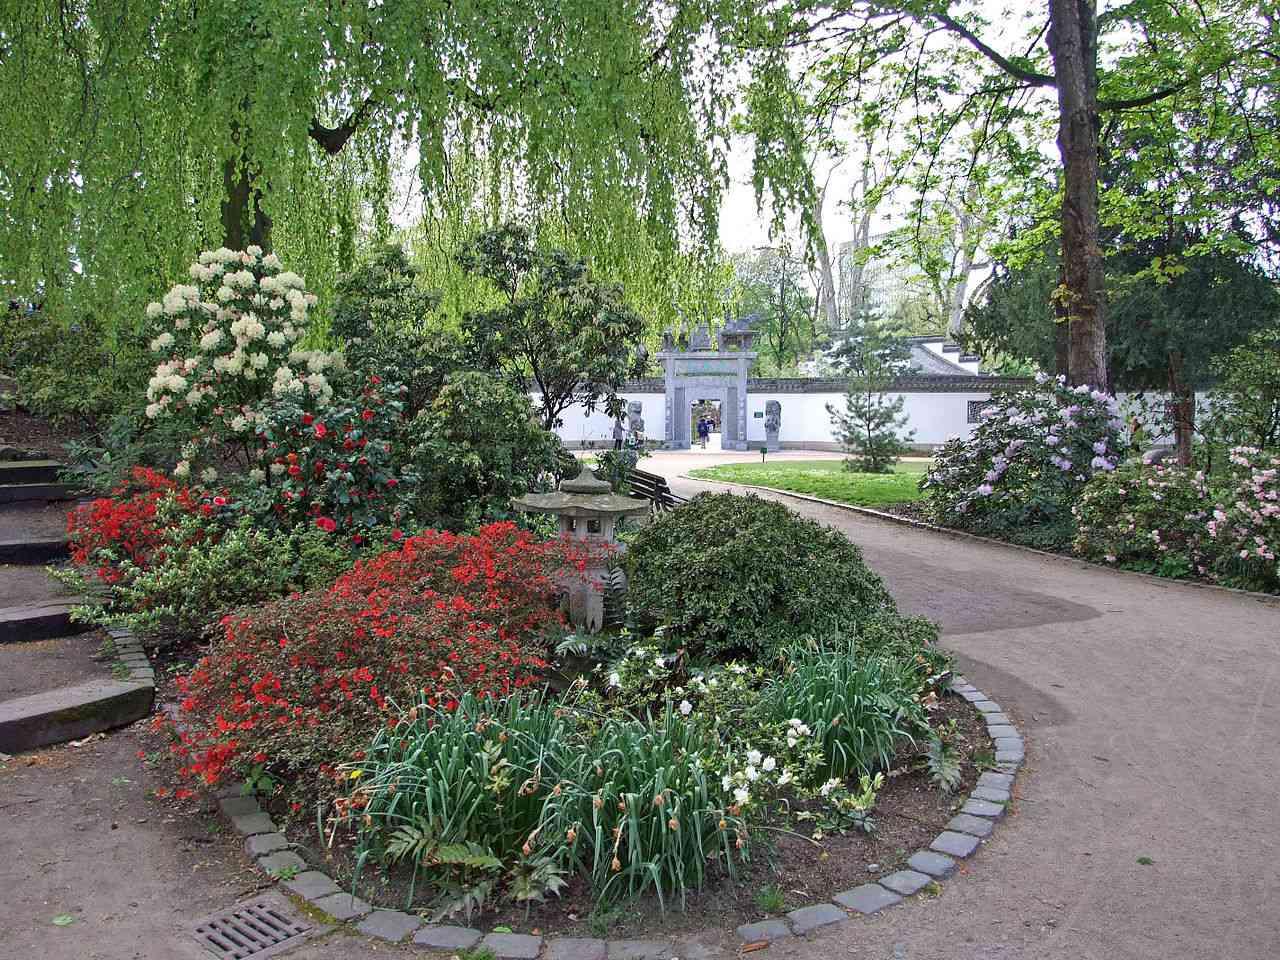 Southside of the Bethmannpark with entrance to Garten des Himmlischen Friedens in Frankfurt